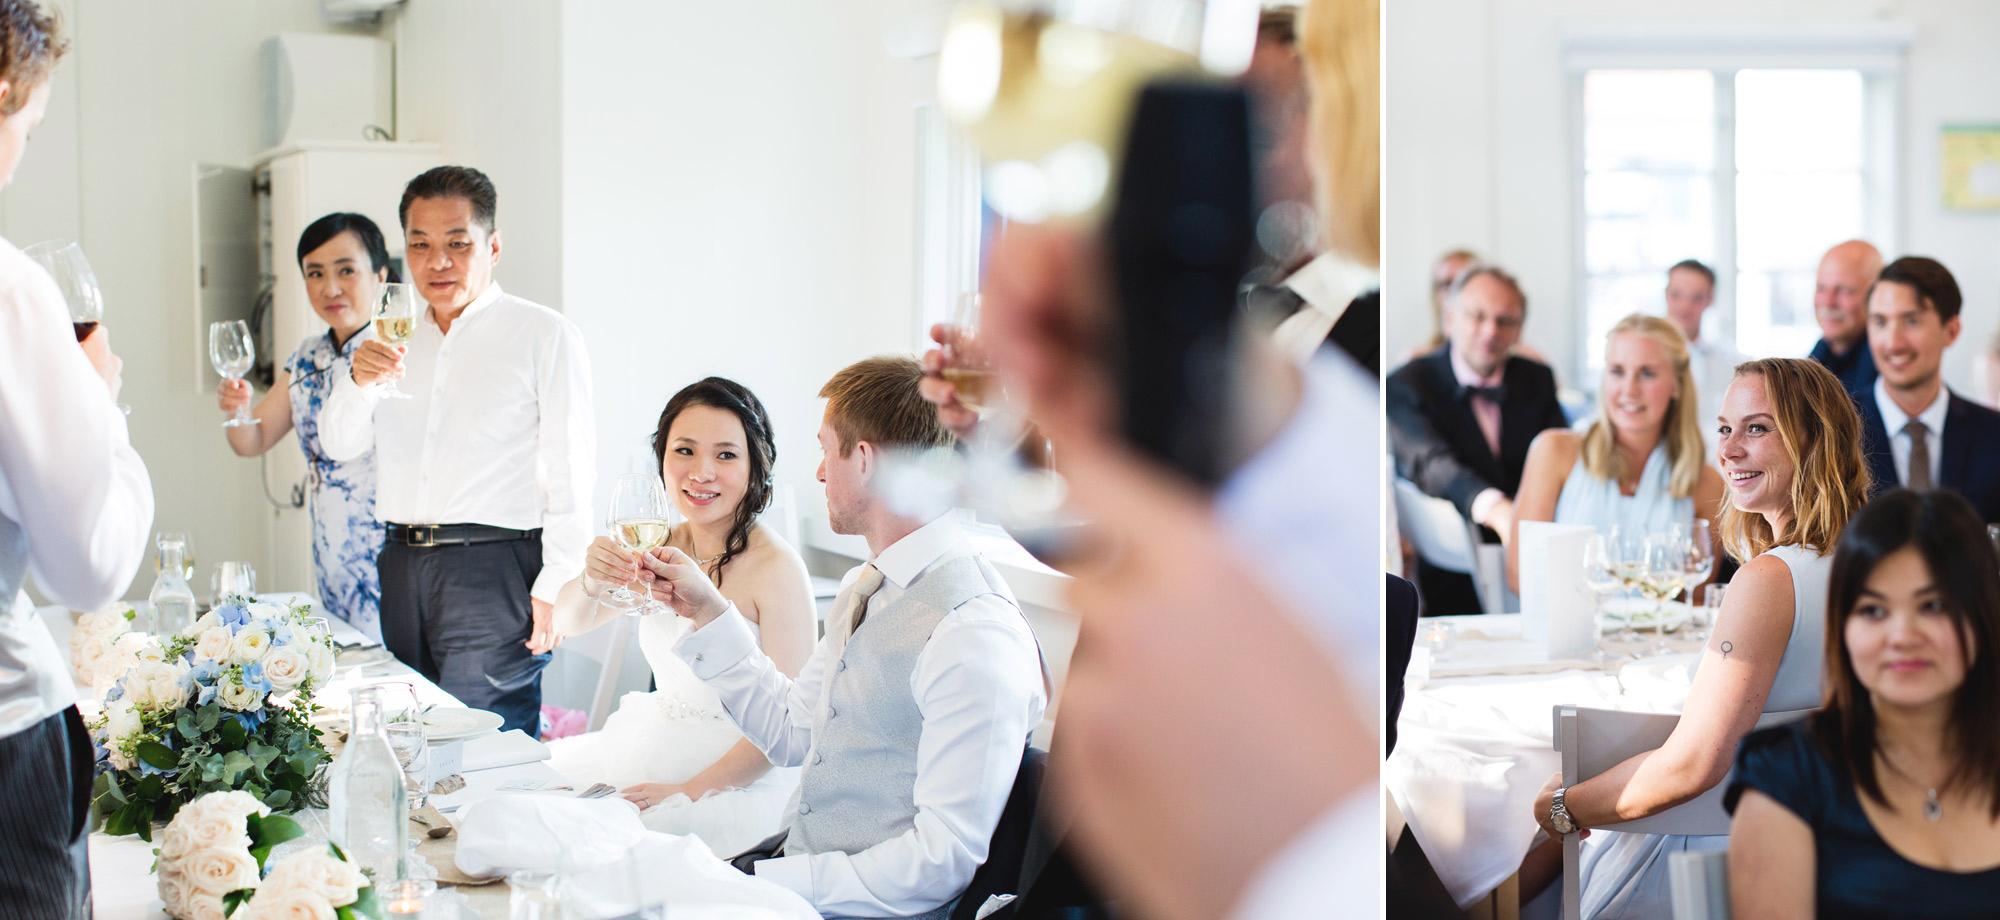 wedding toasts at marholmen sweden